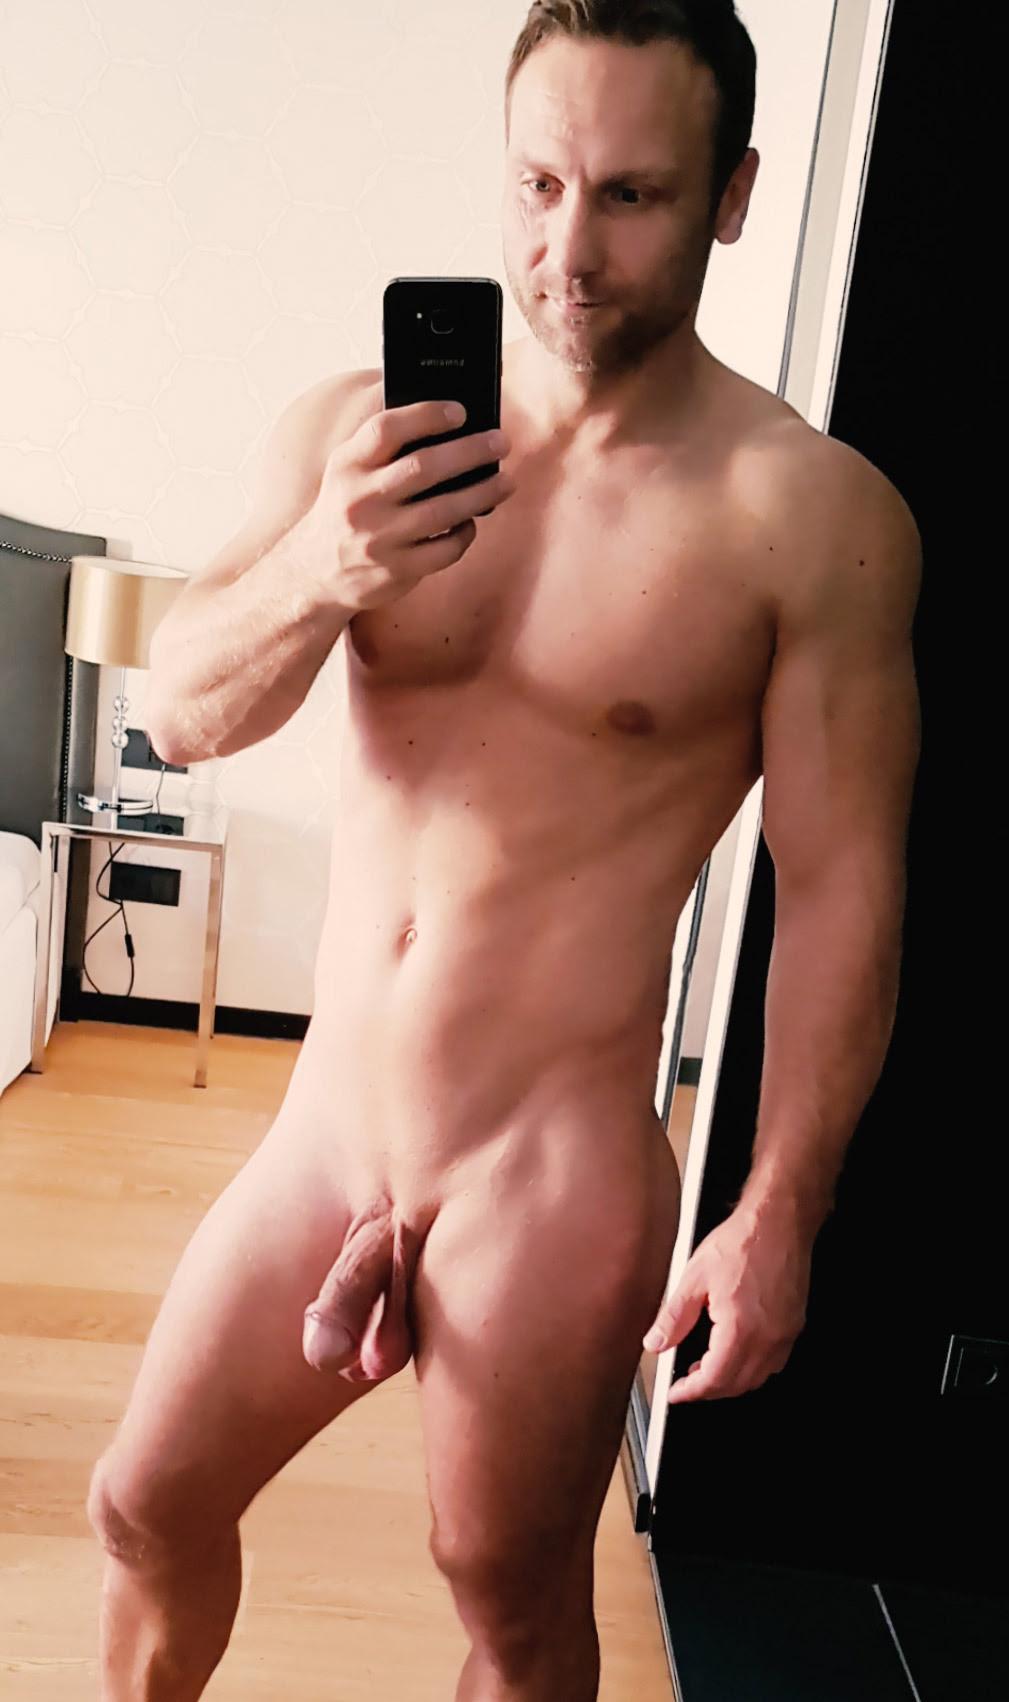 Sfbarefeet The Naked Selfie Snap Away Guys-9445